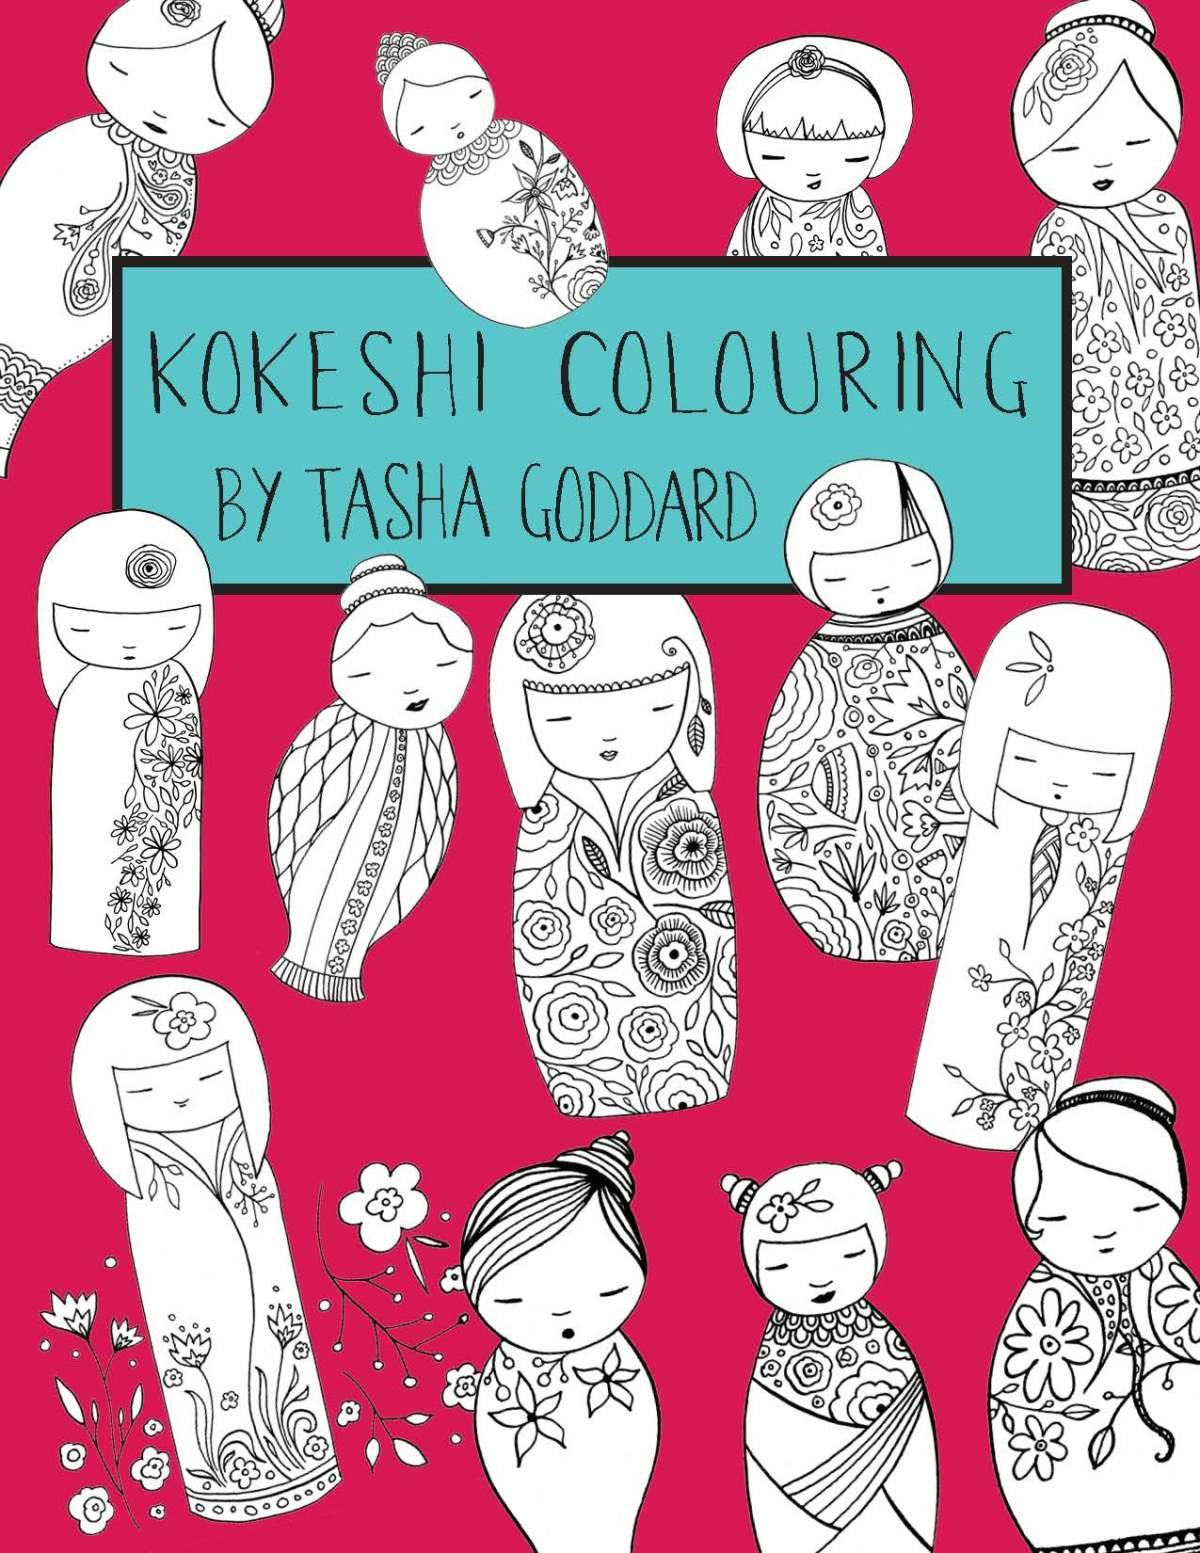 Kokeshi Colouring Book by Tasha Goddard - buy from https://www.etsy.com/uk/listing/531232504/kokeshi-colouring